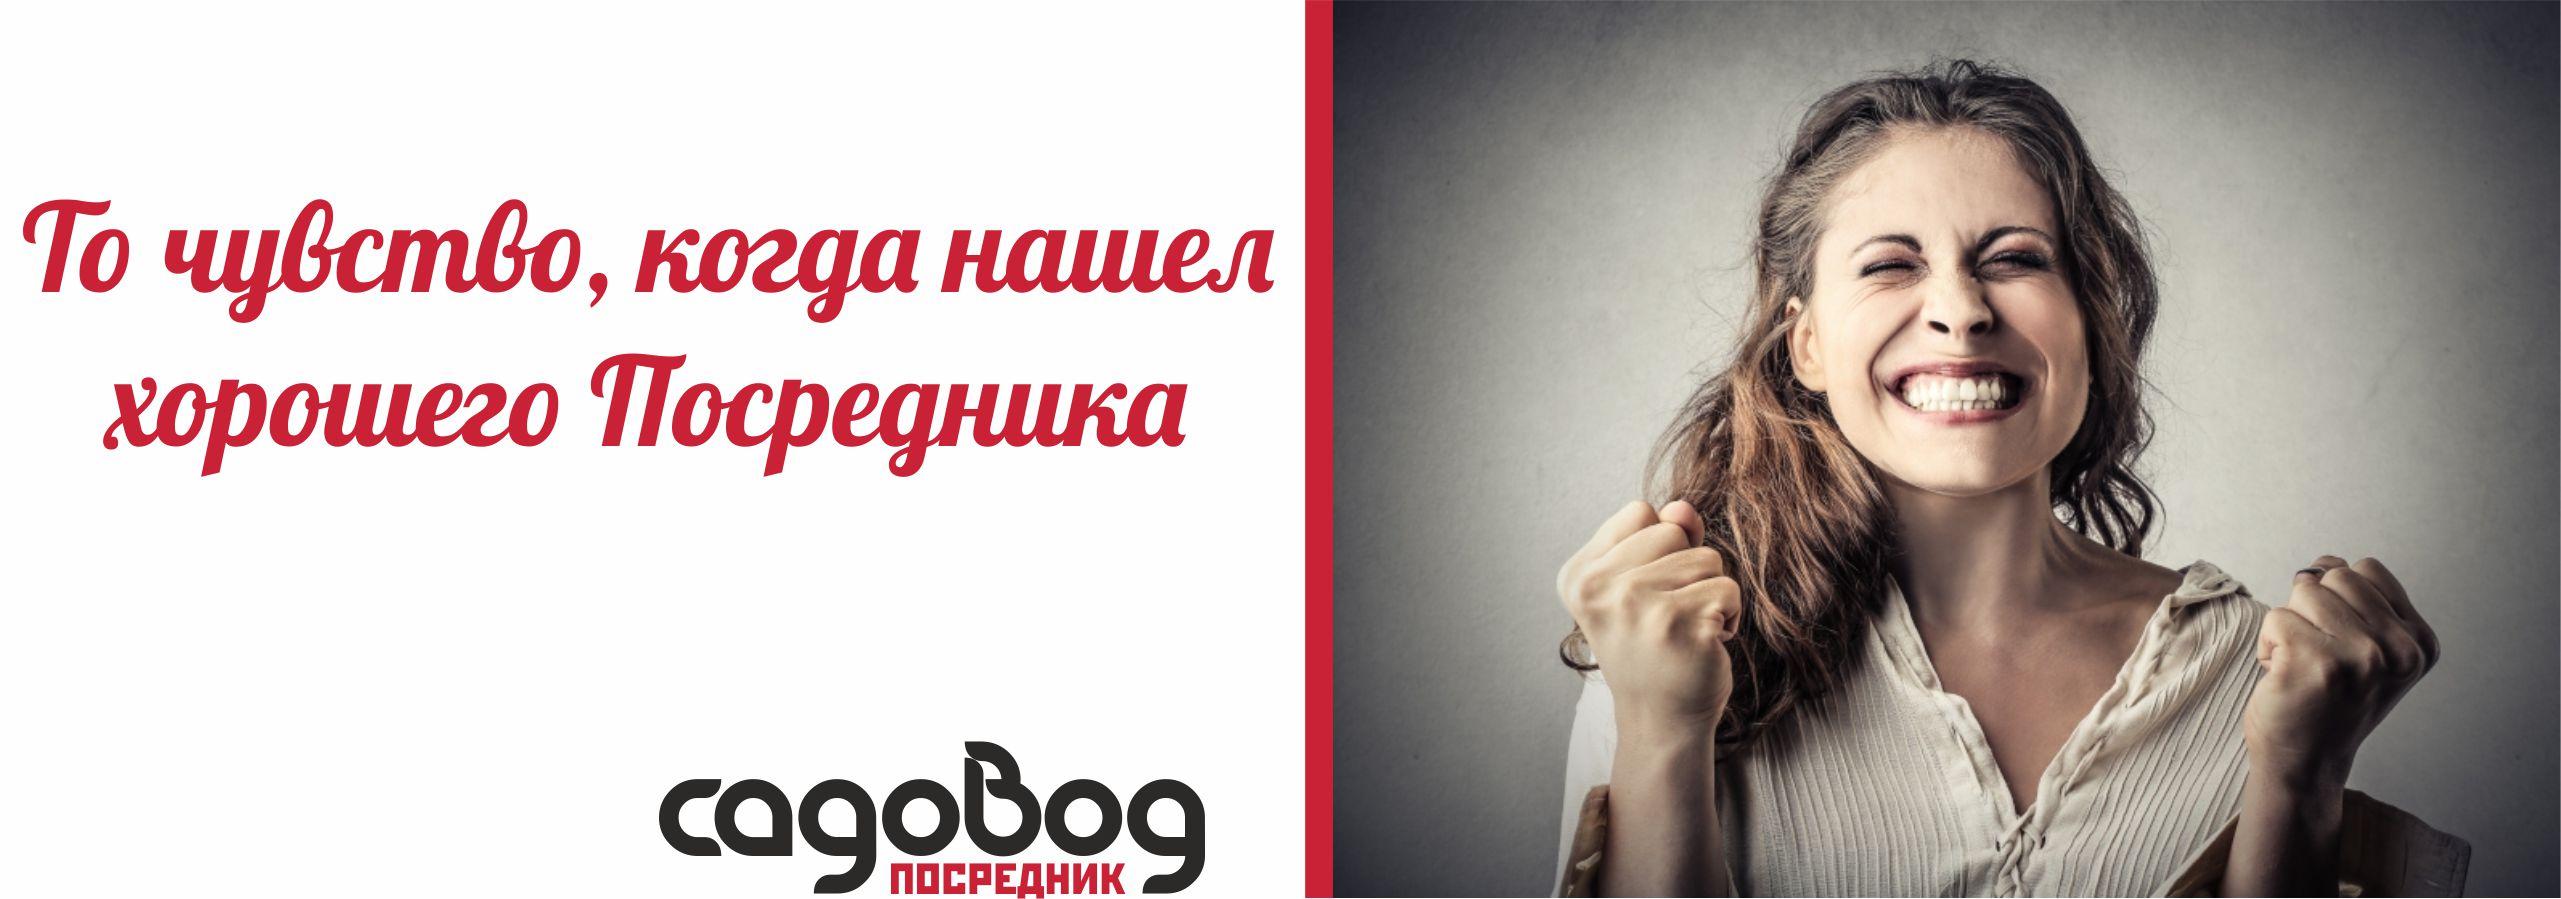 http://orgsp.ru/slide01.jpg